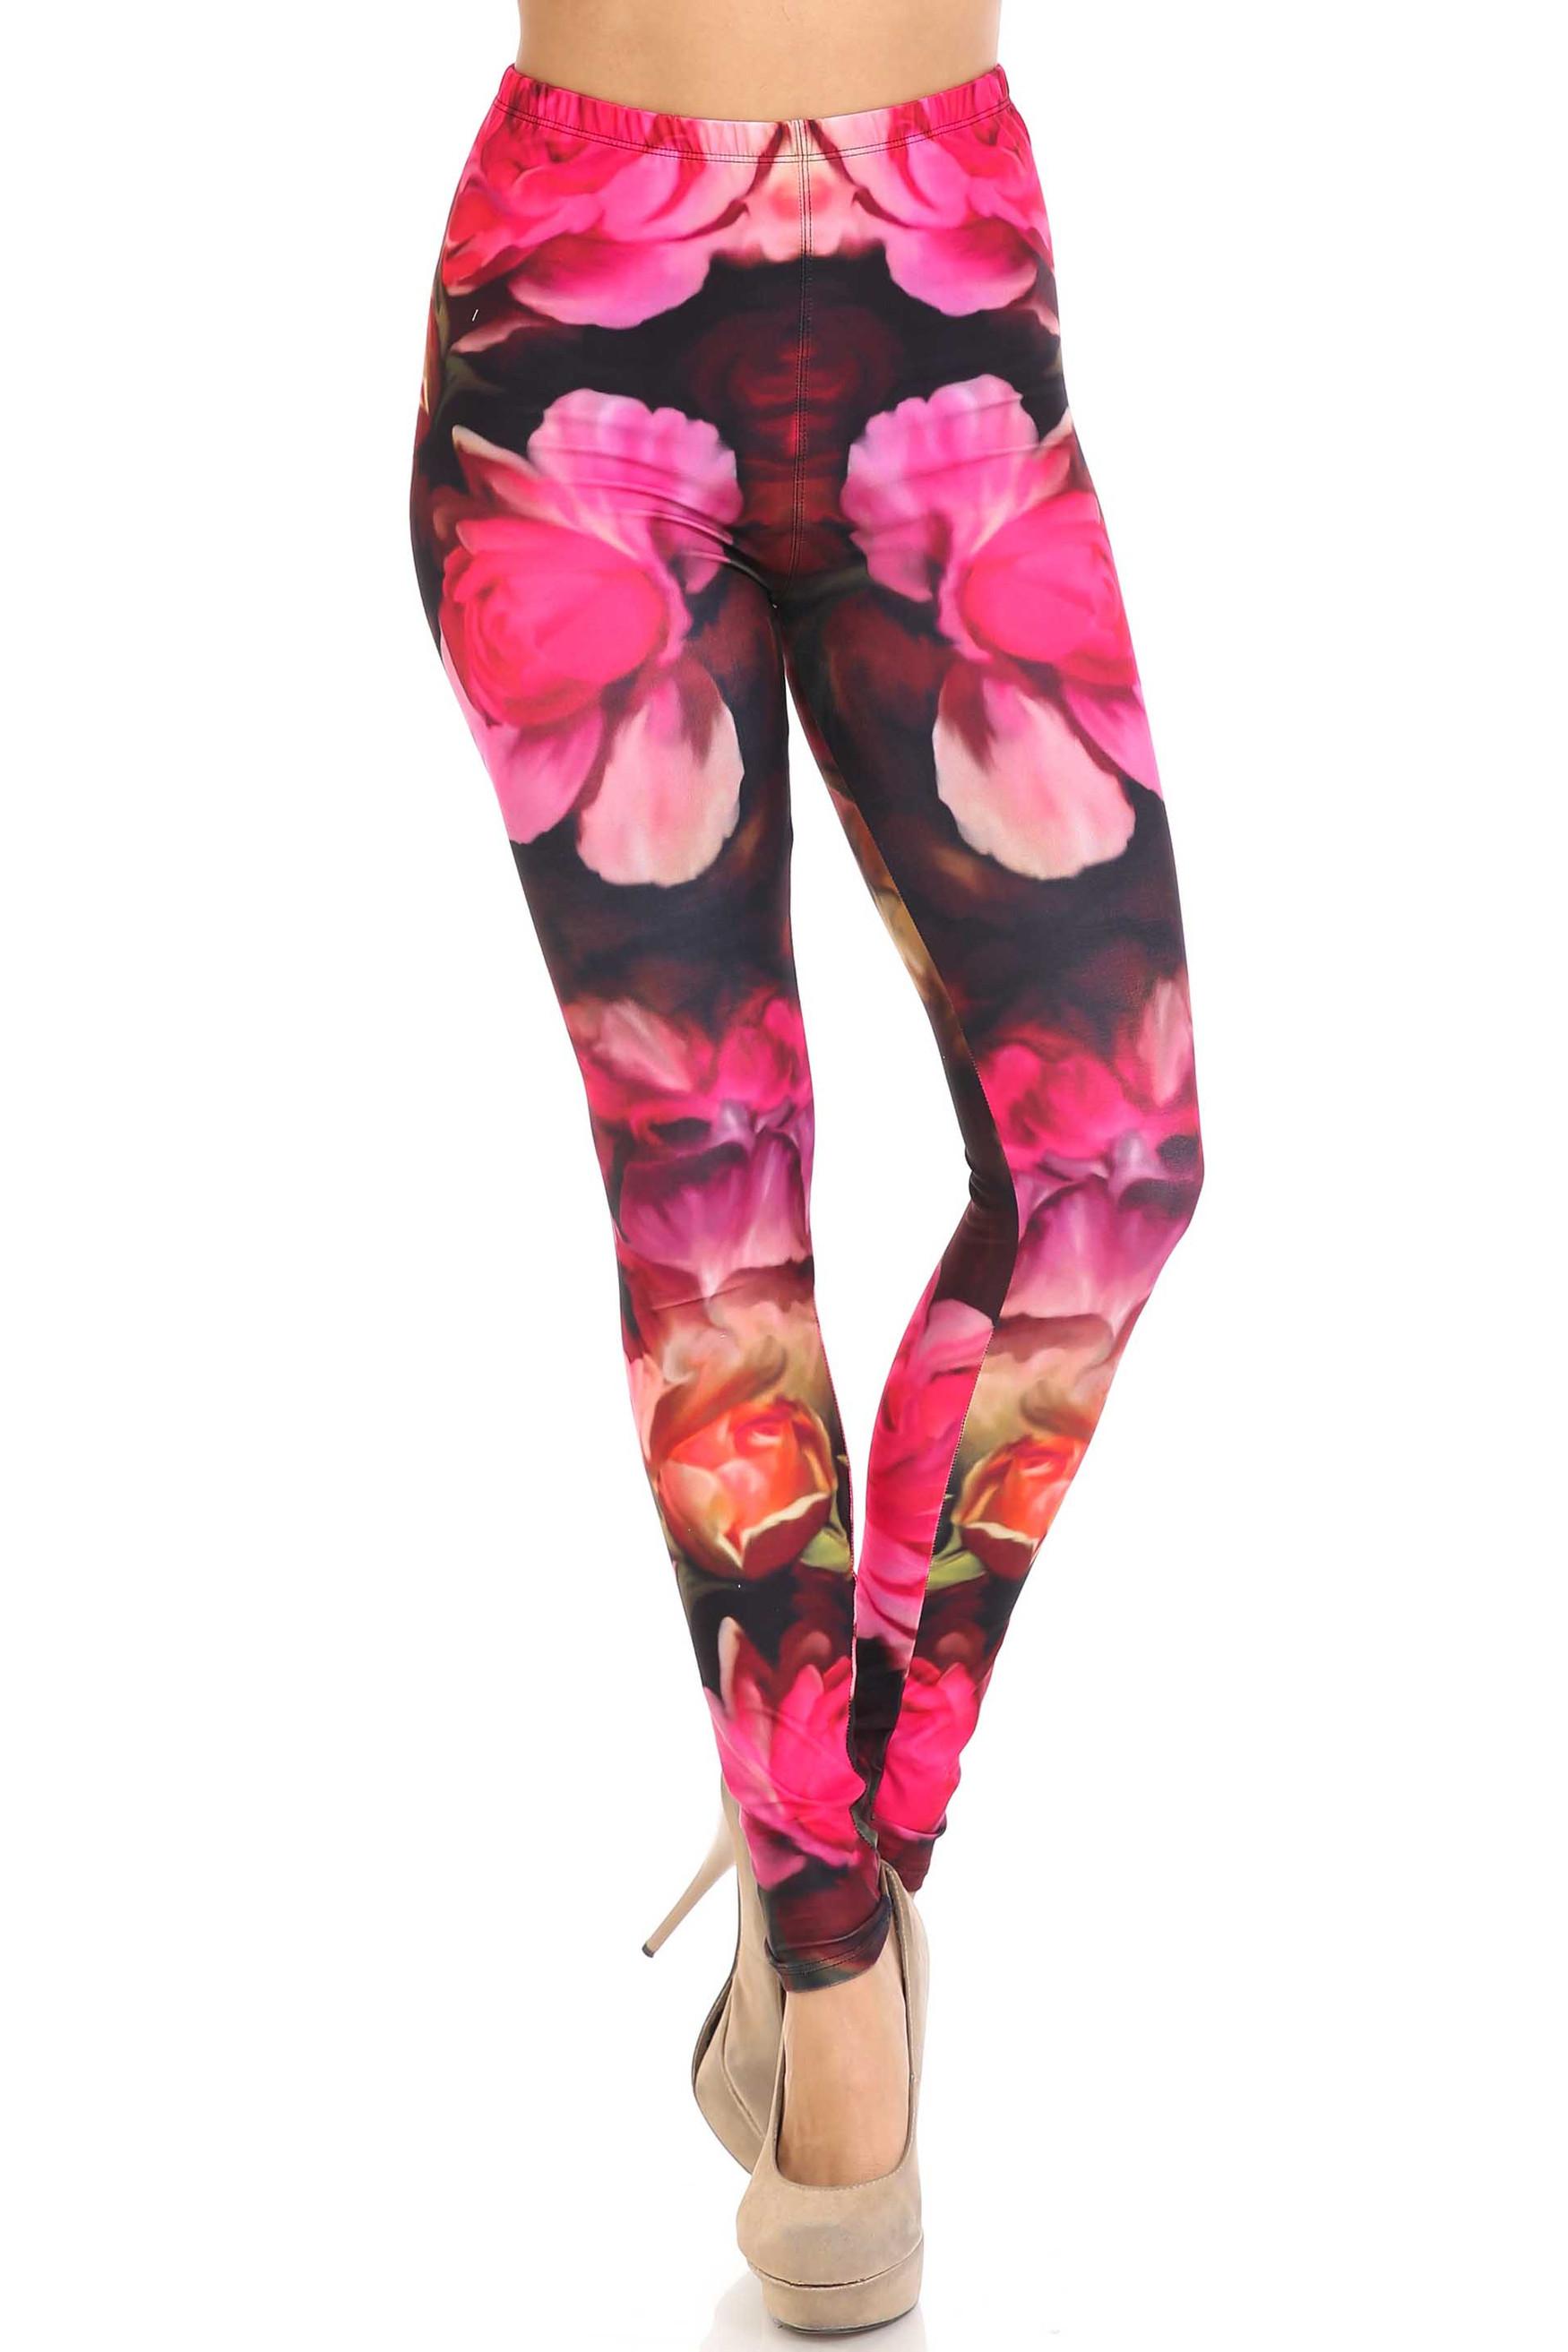 Creamy Soft Vintage Rose Plus Size Leggings - USA Fashion™